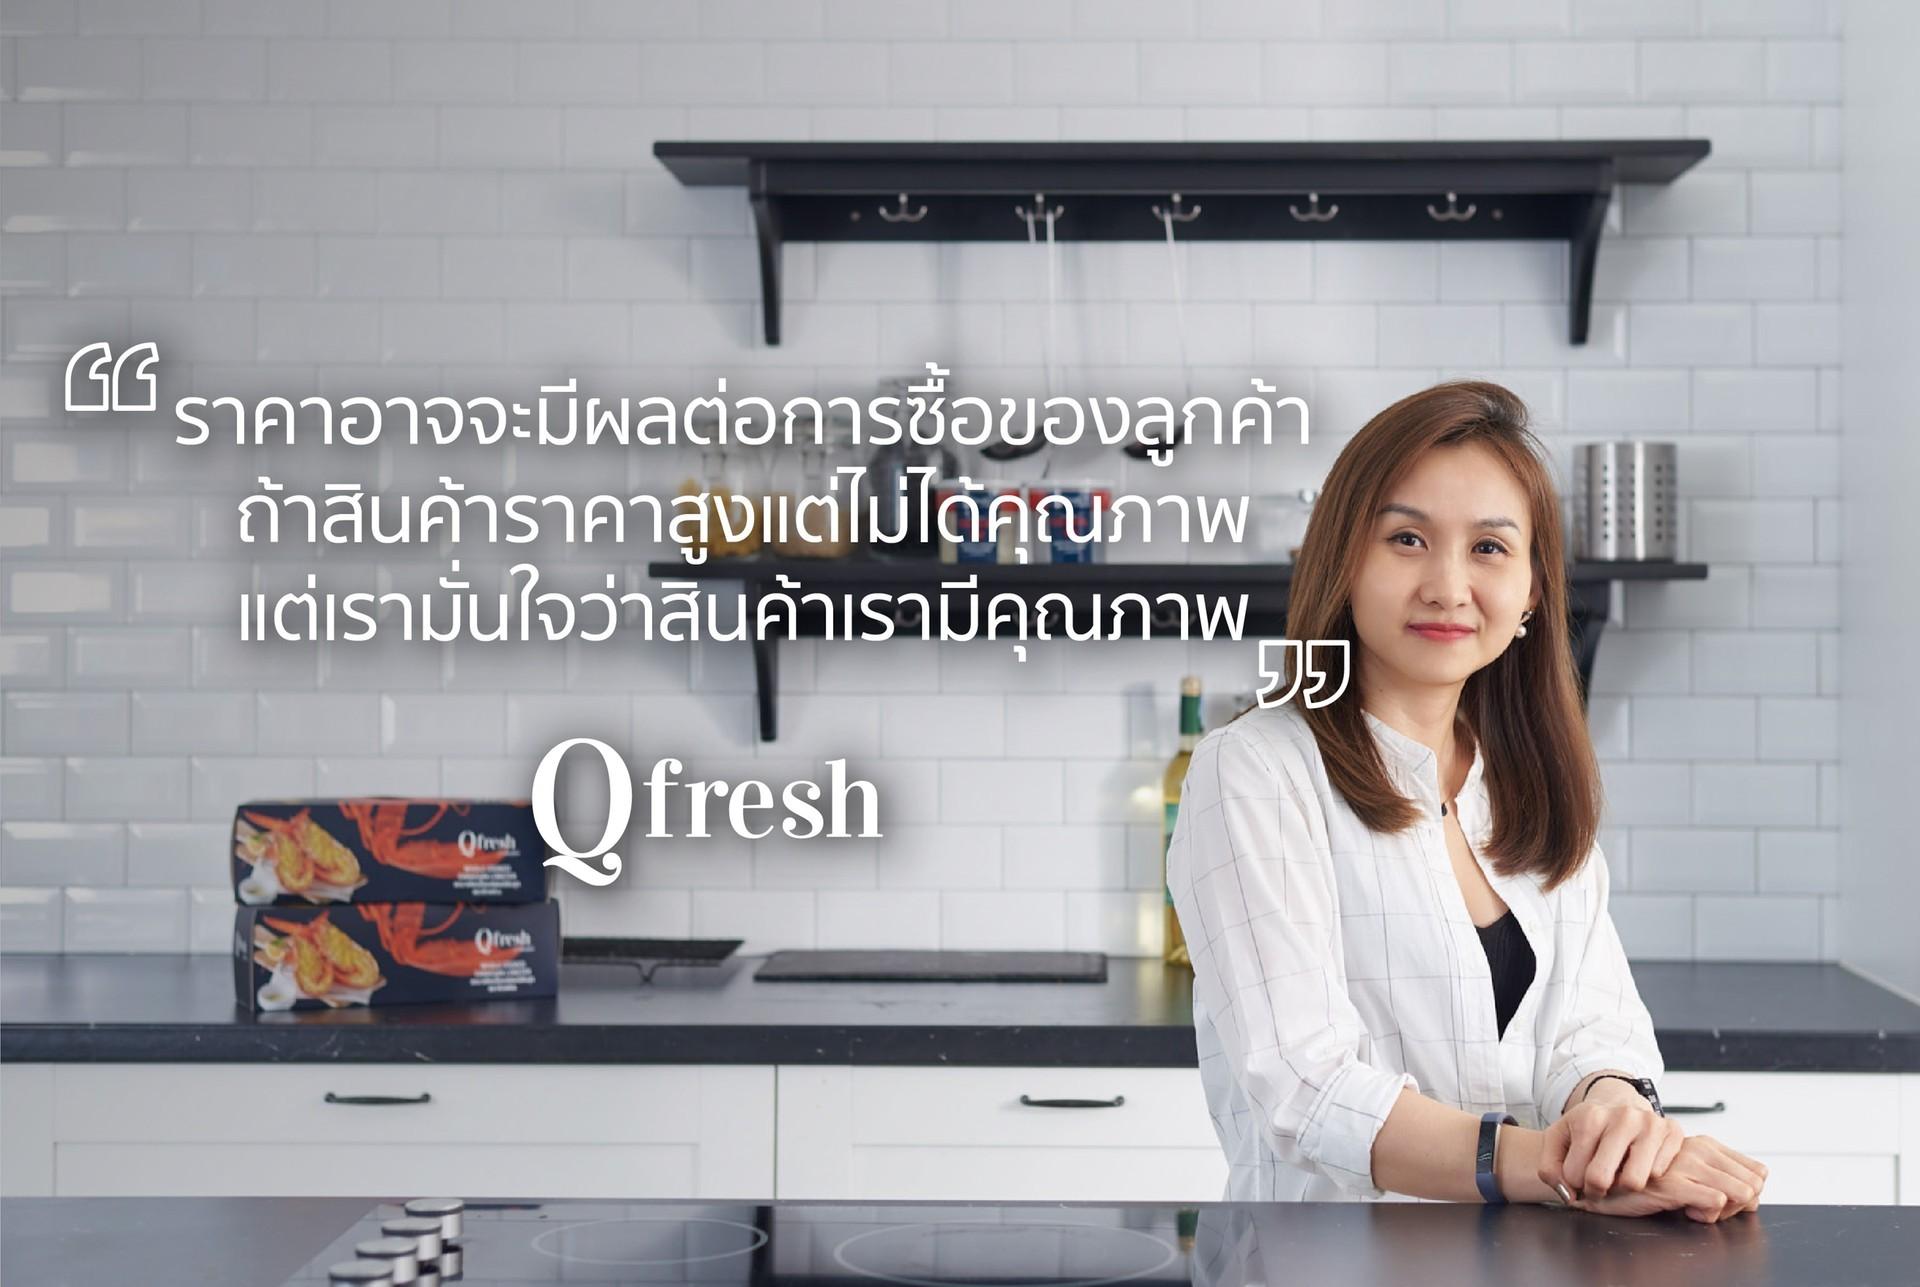 Qfresh